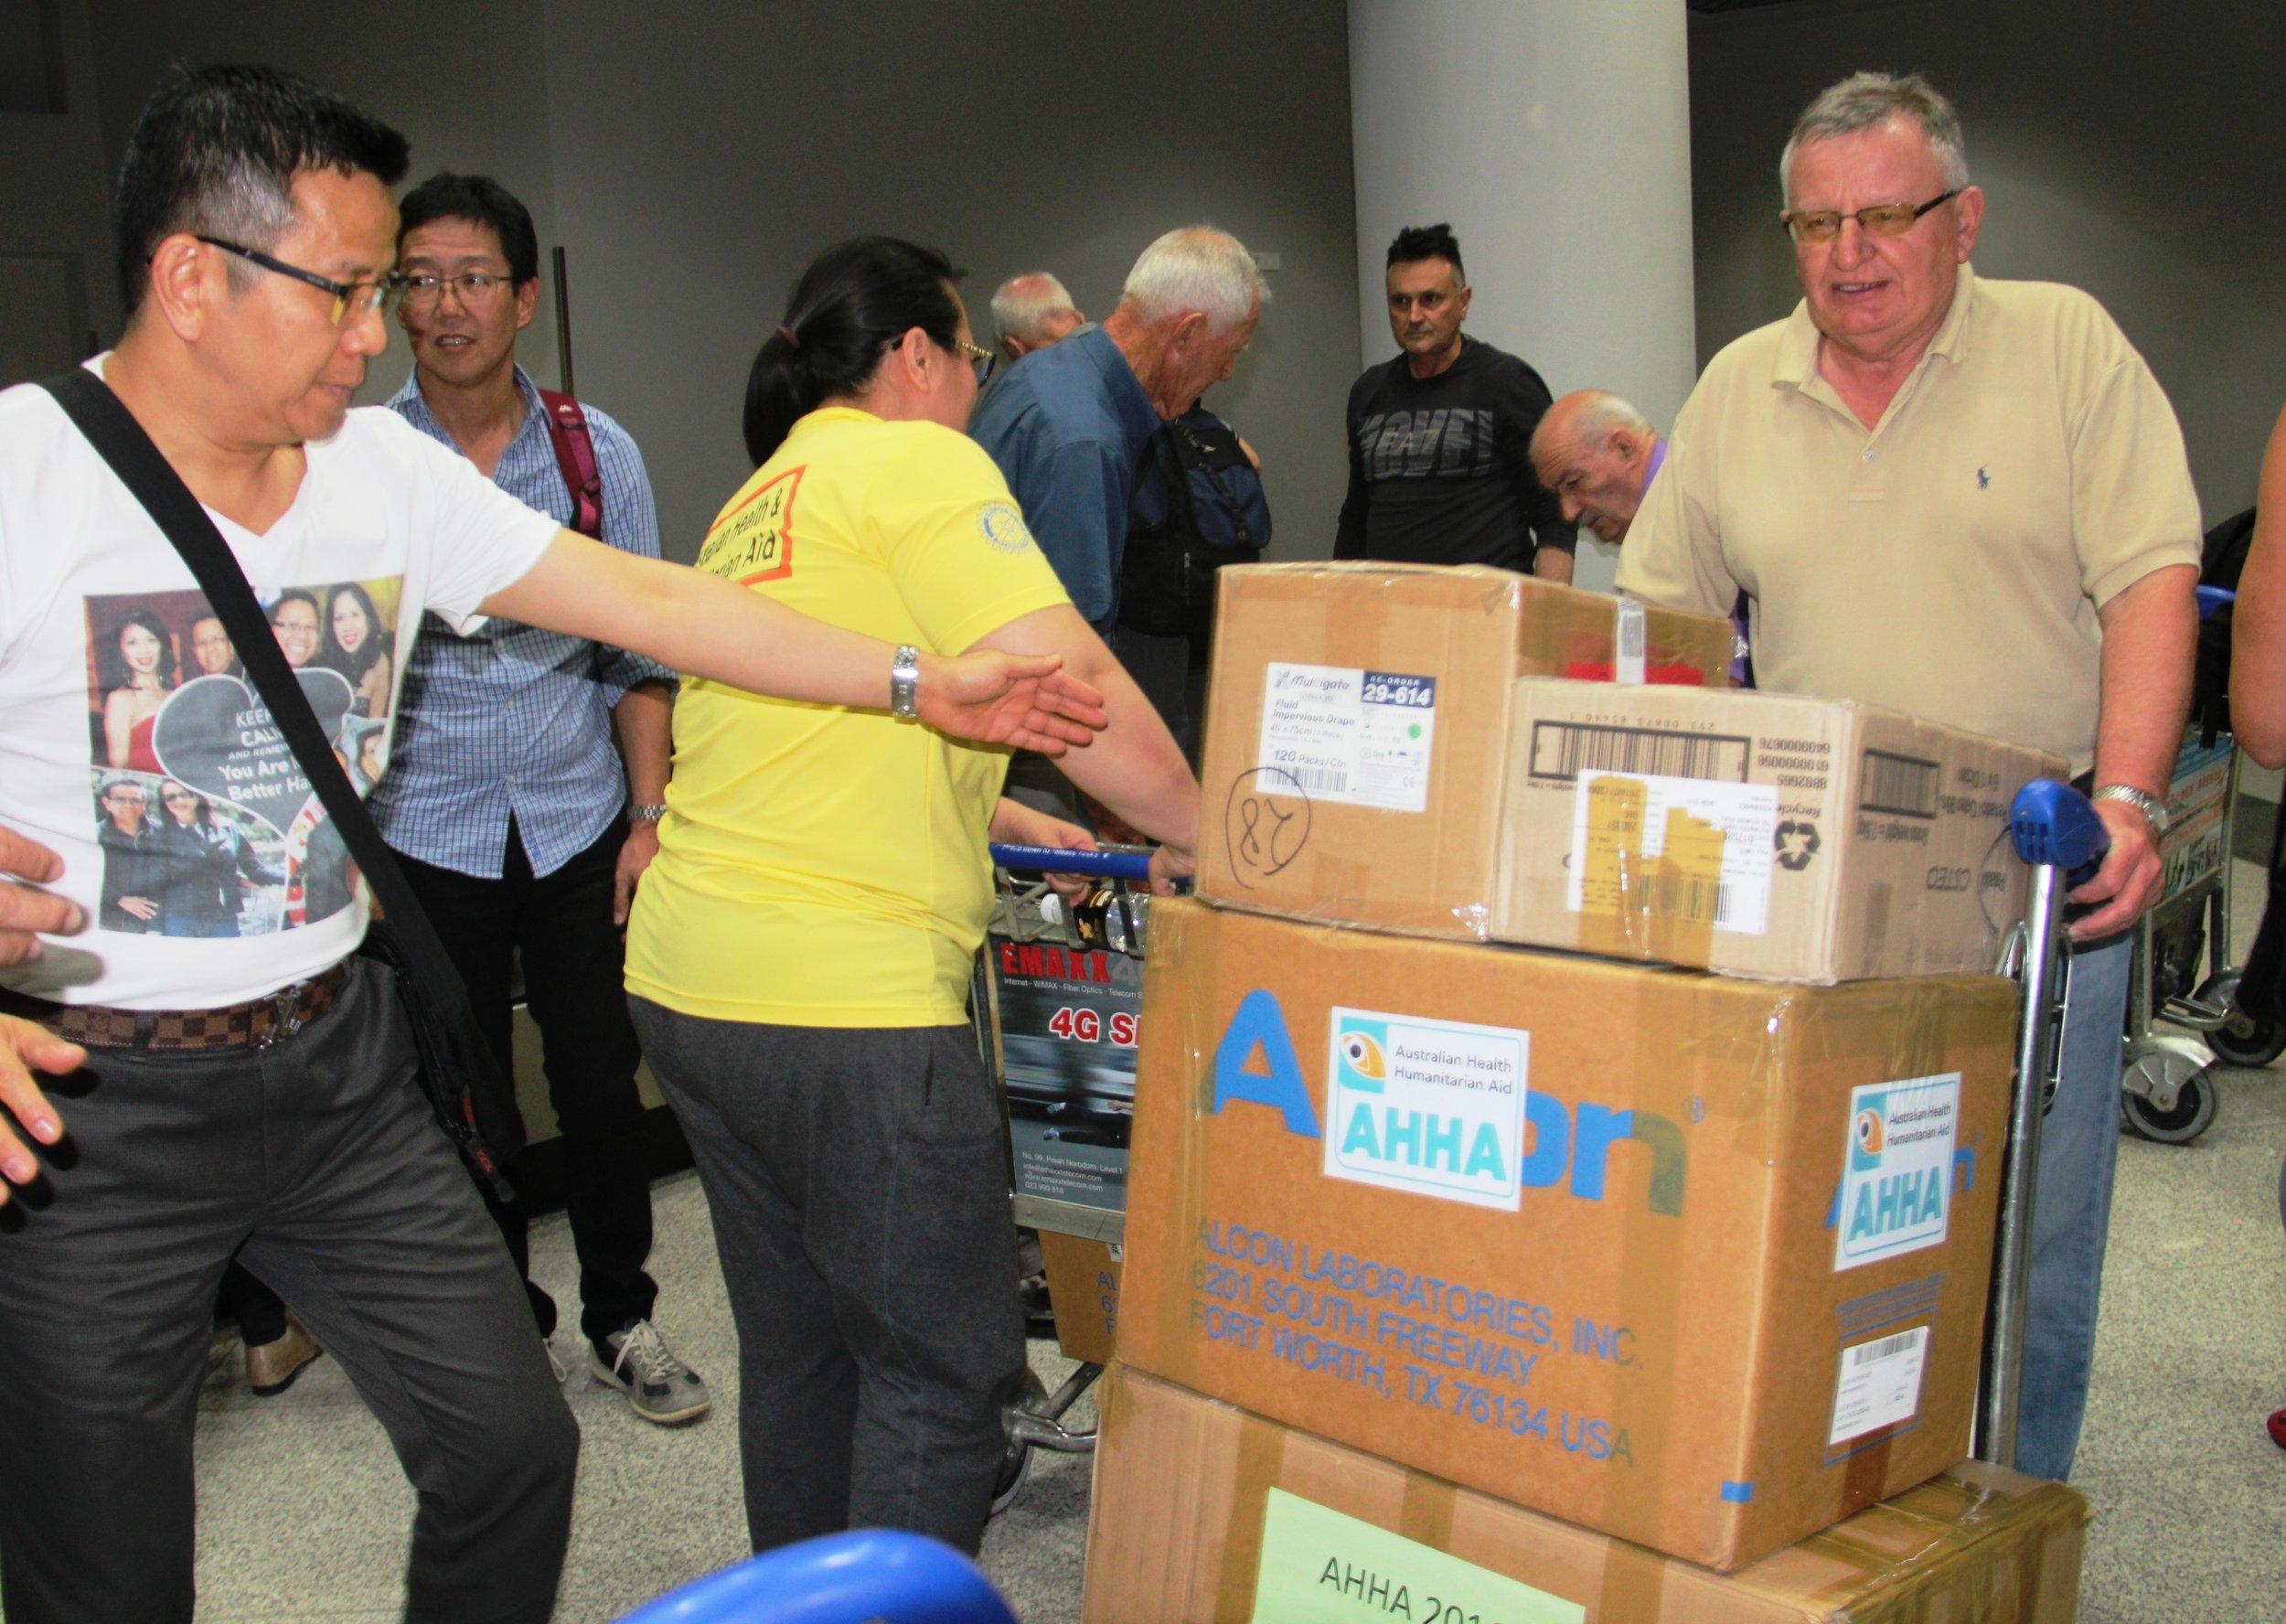 Volunteers unloading boxes at Phnom Penh airport